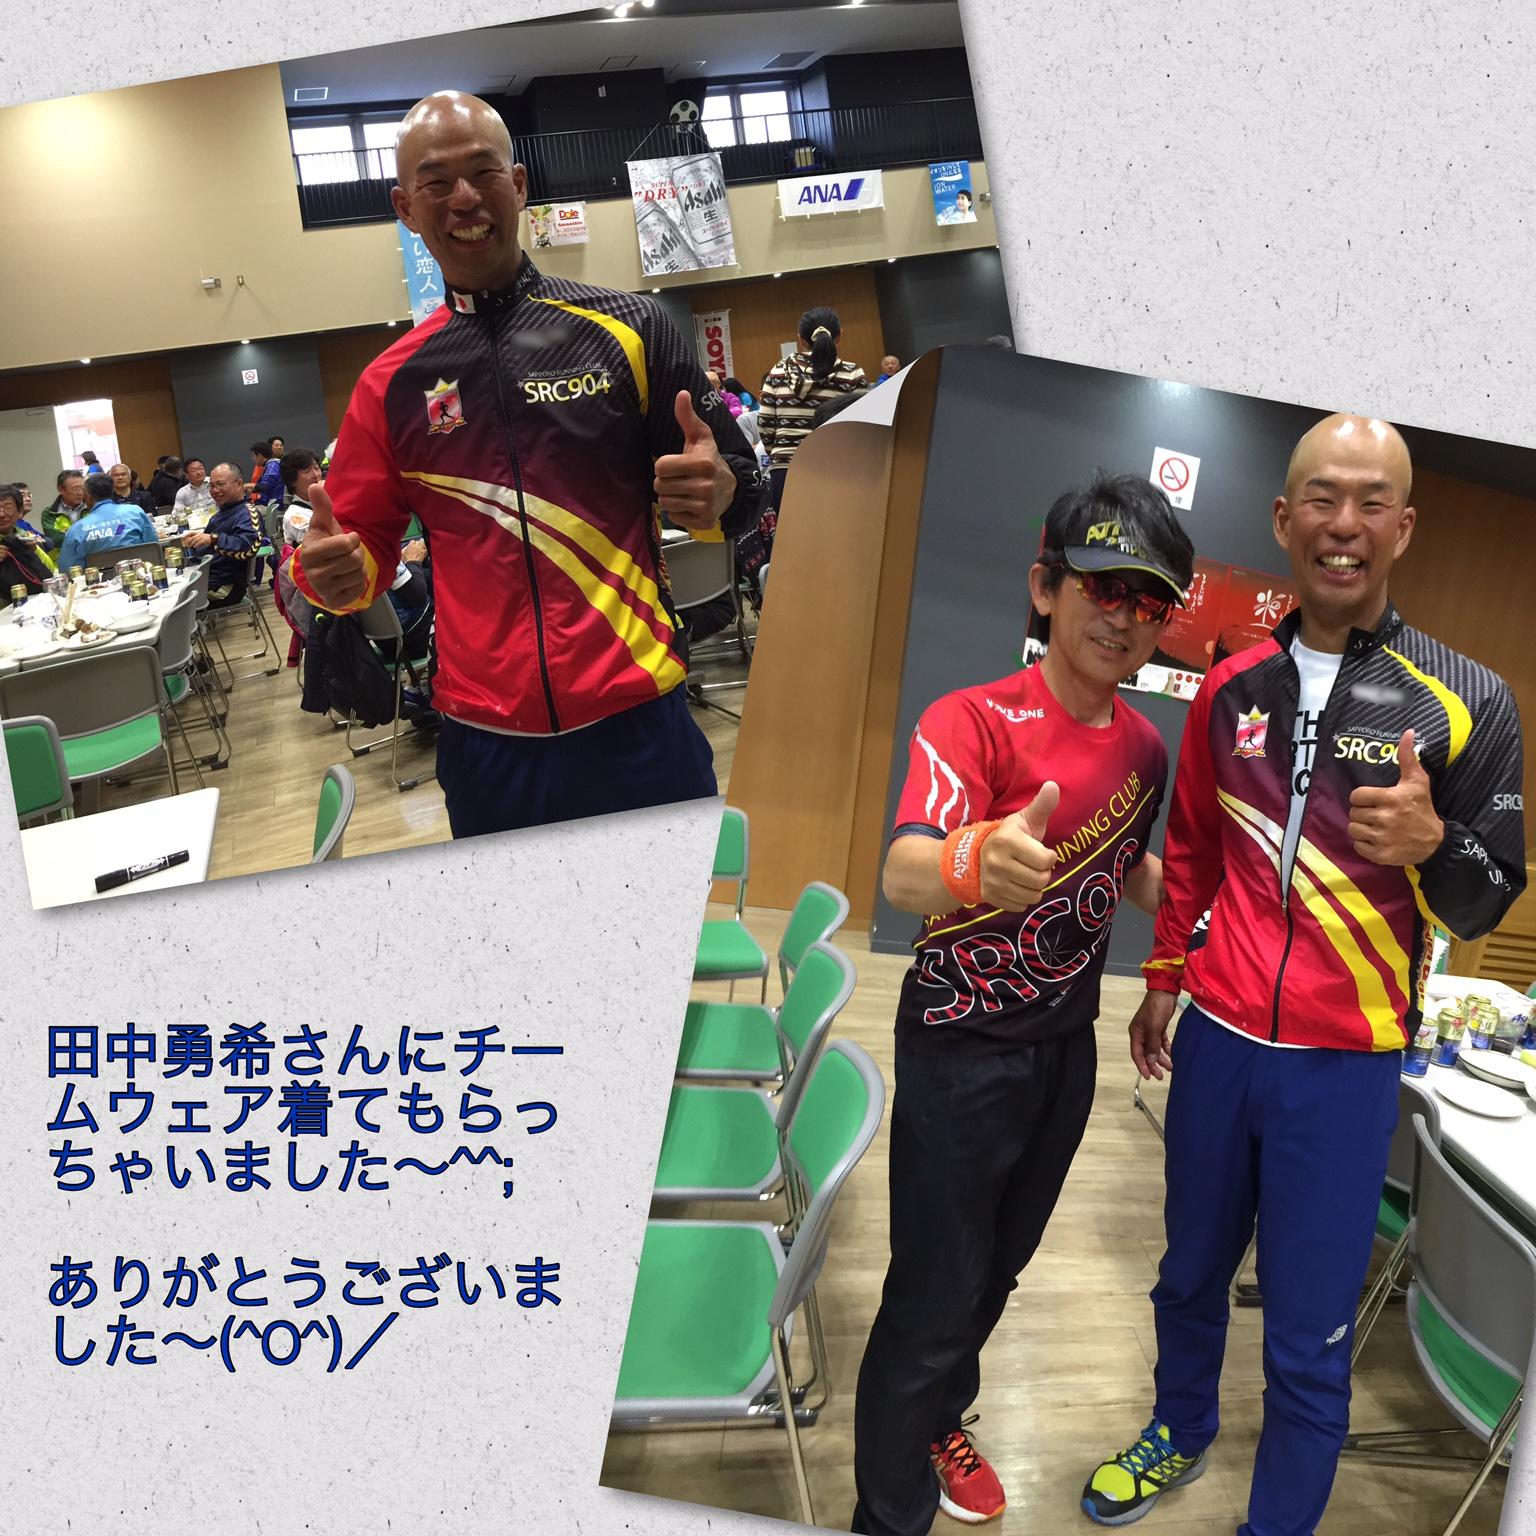 image10_20160614214053531.jpg